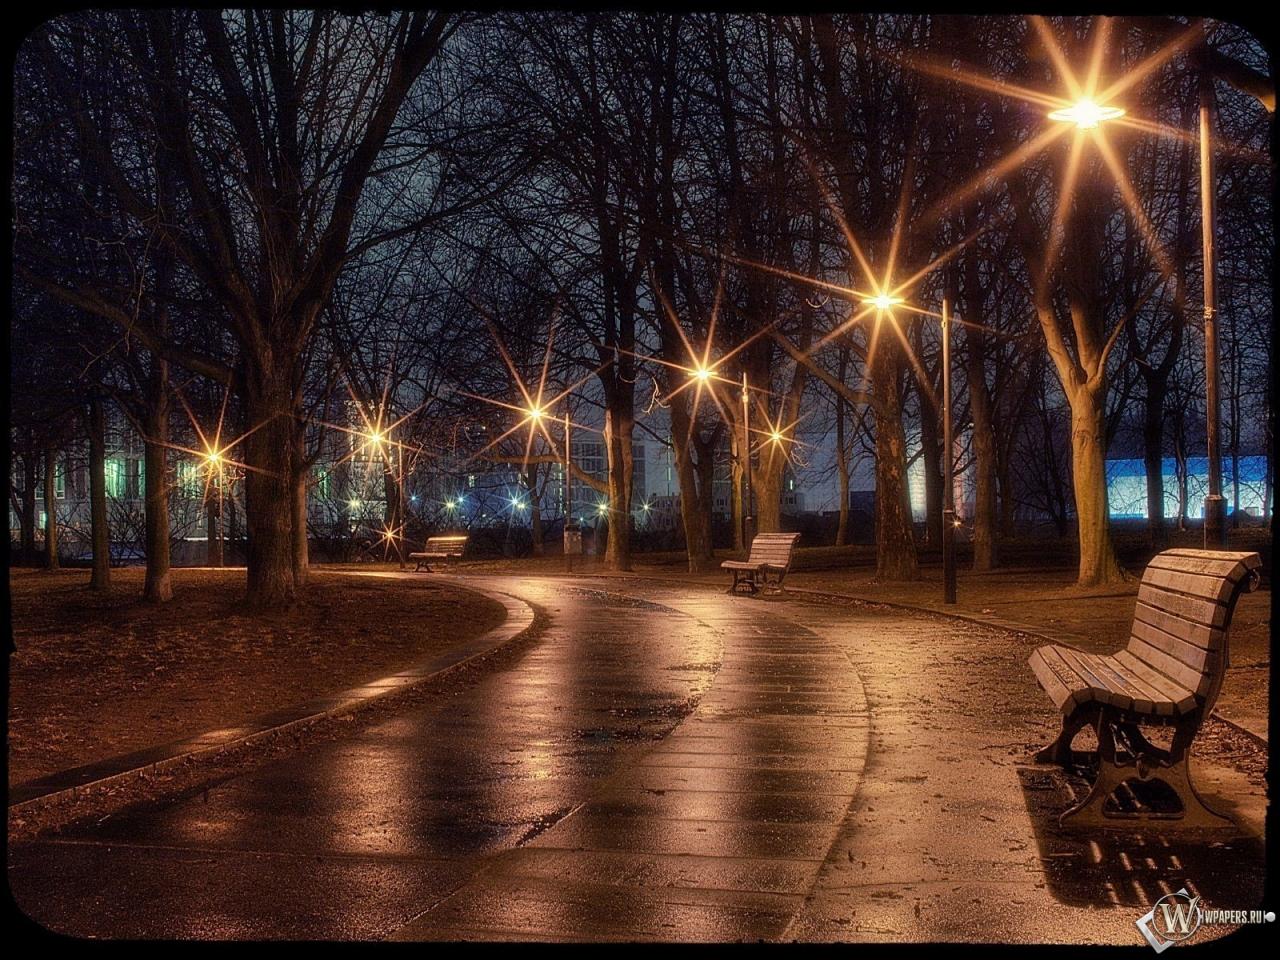 Ночная аллея 1280x960